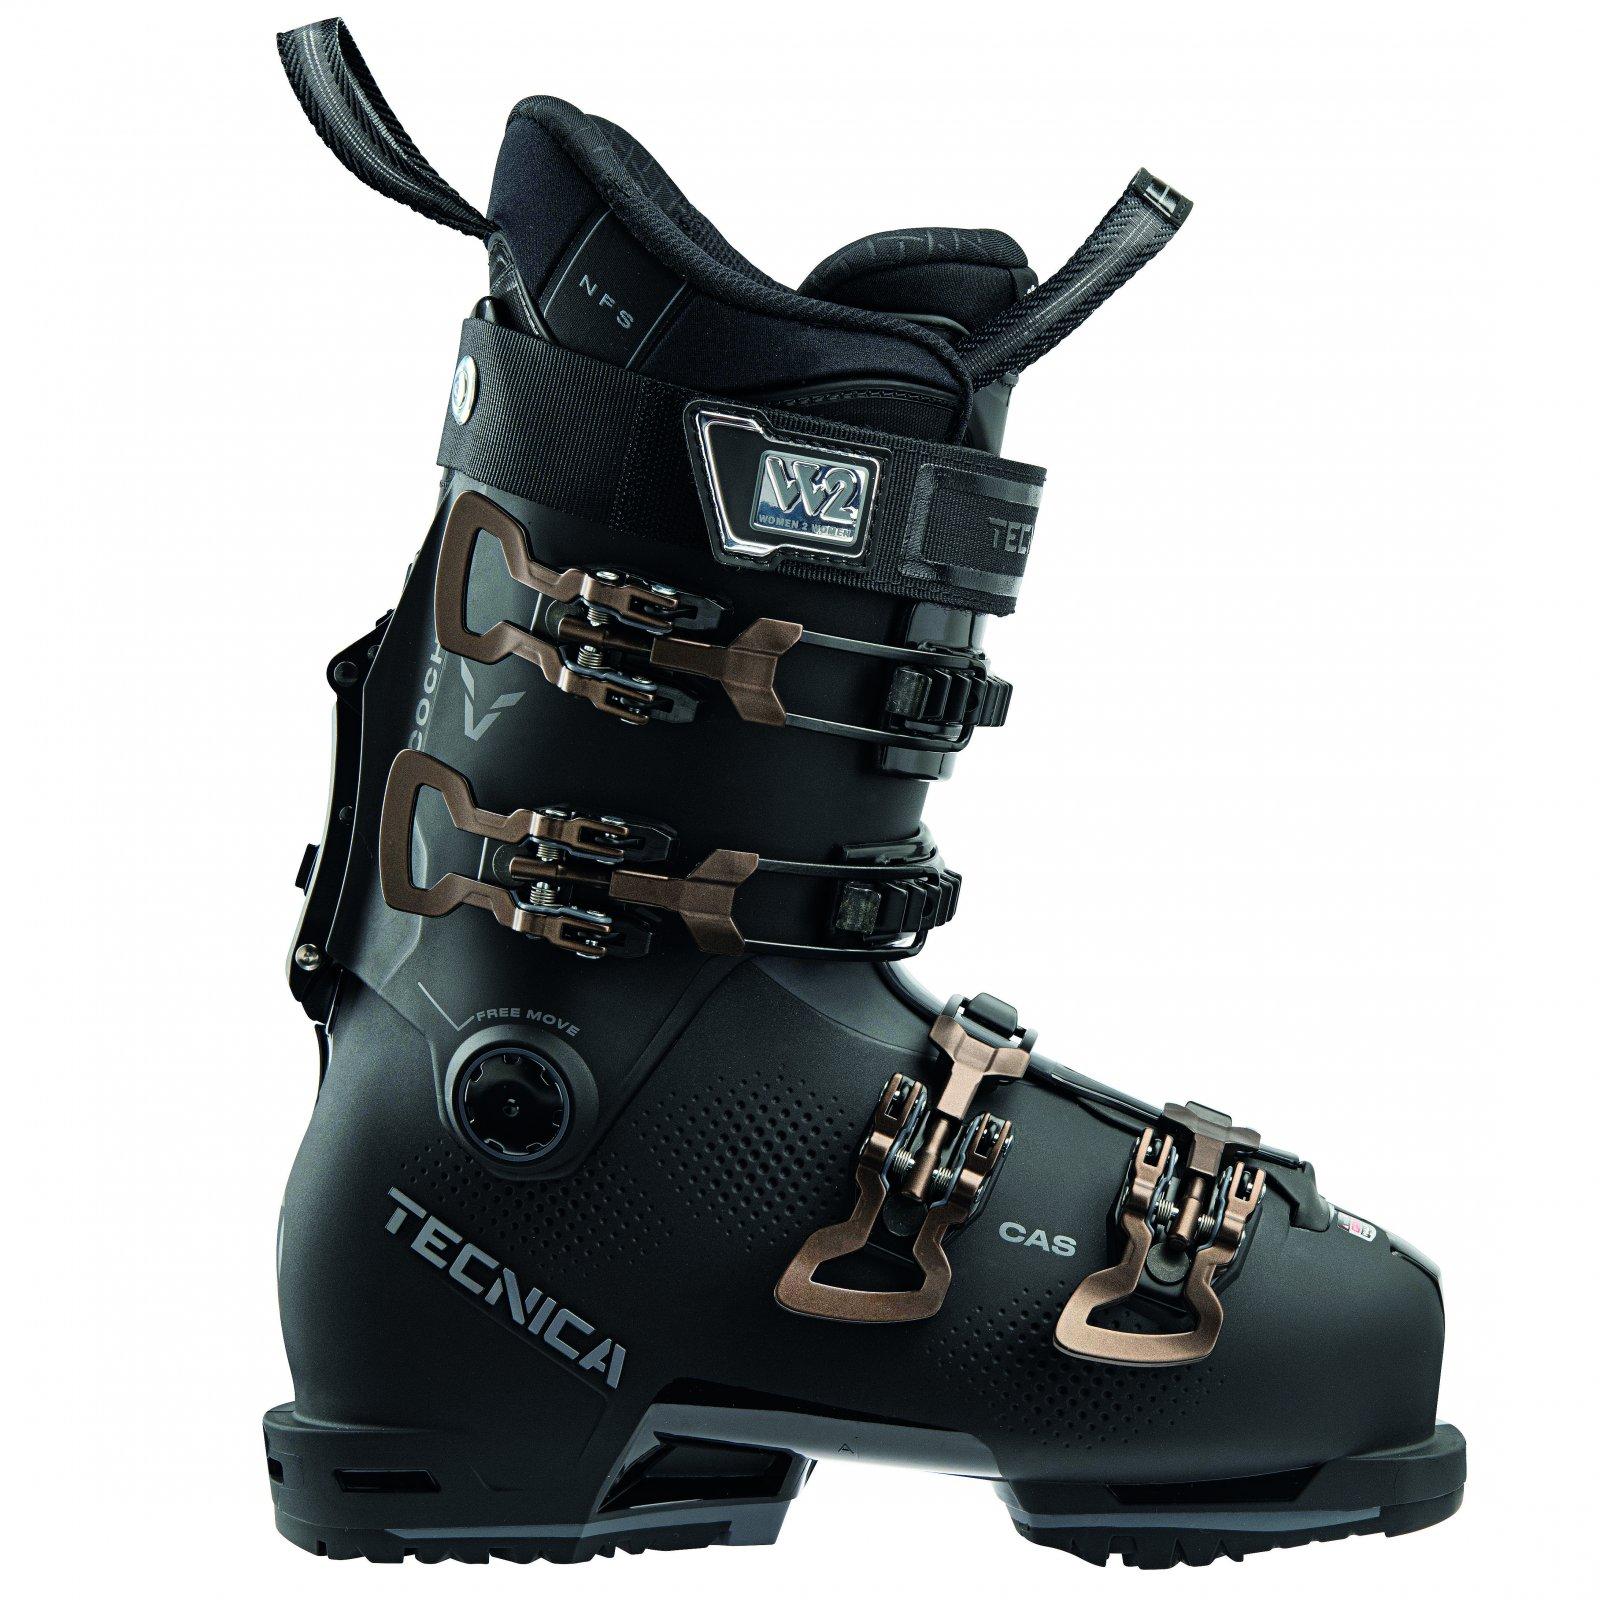 2022 Tecnica Cochise 85 GW Women's Ski Boots